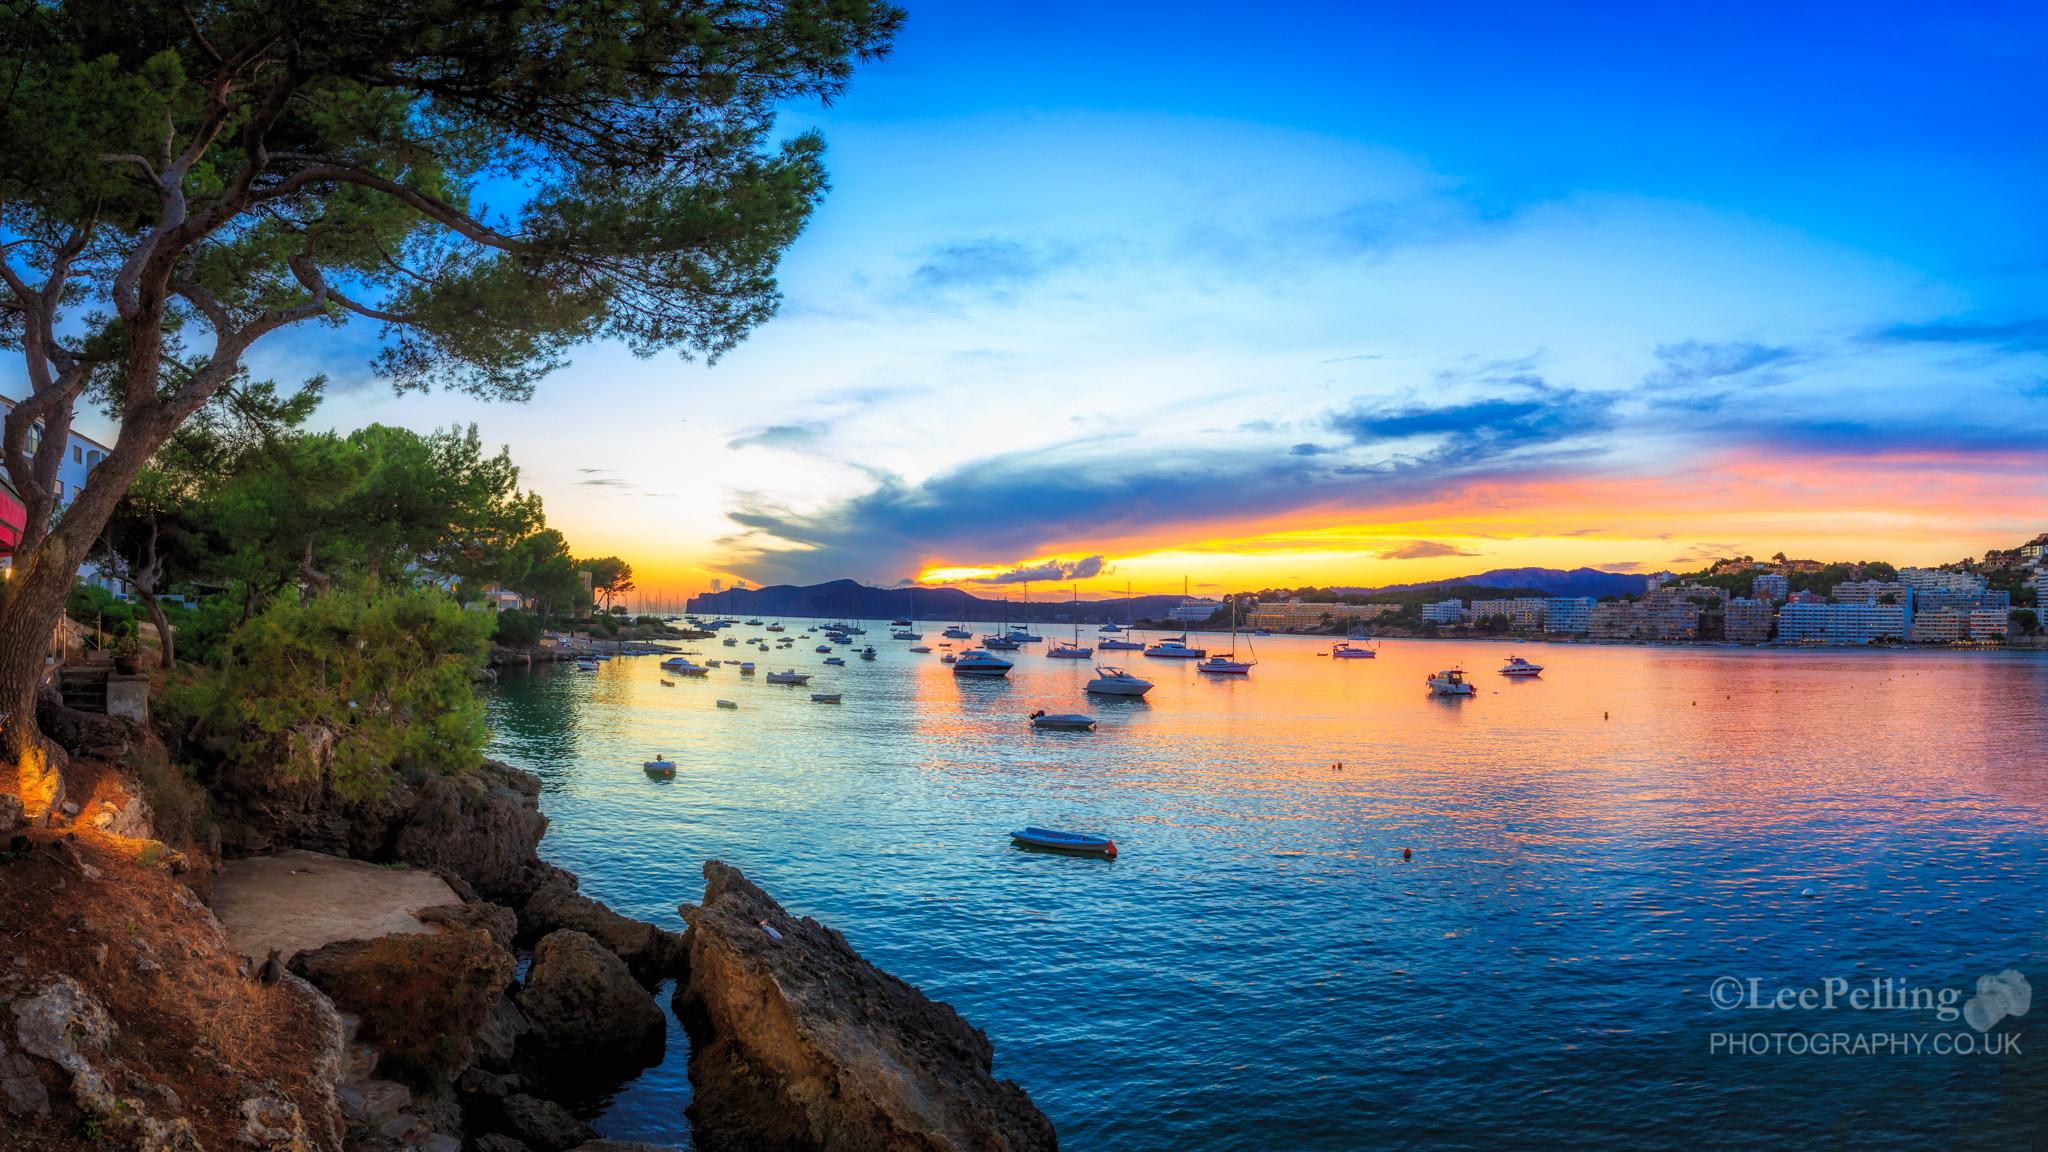 Sunset Santa Ponsa from El Balcon De Maria